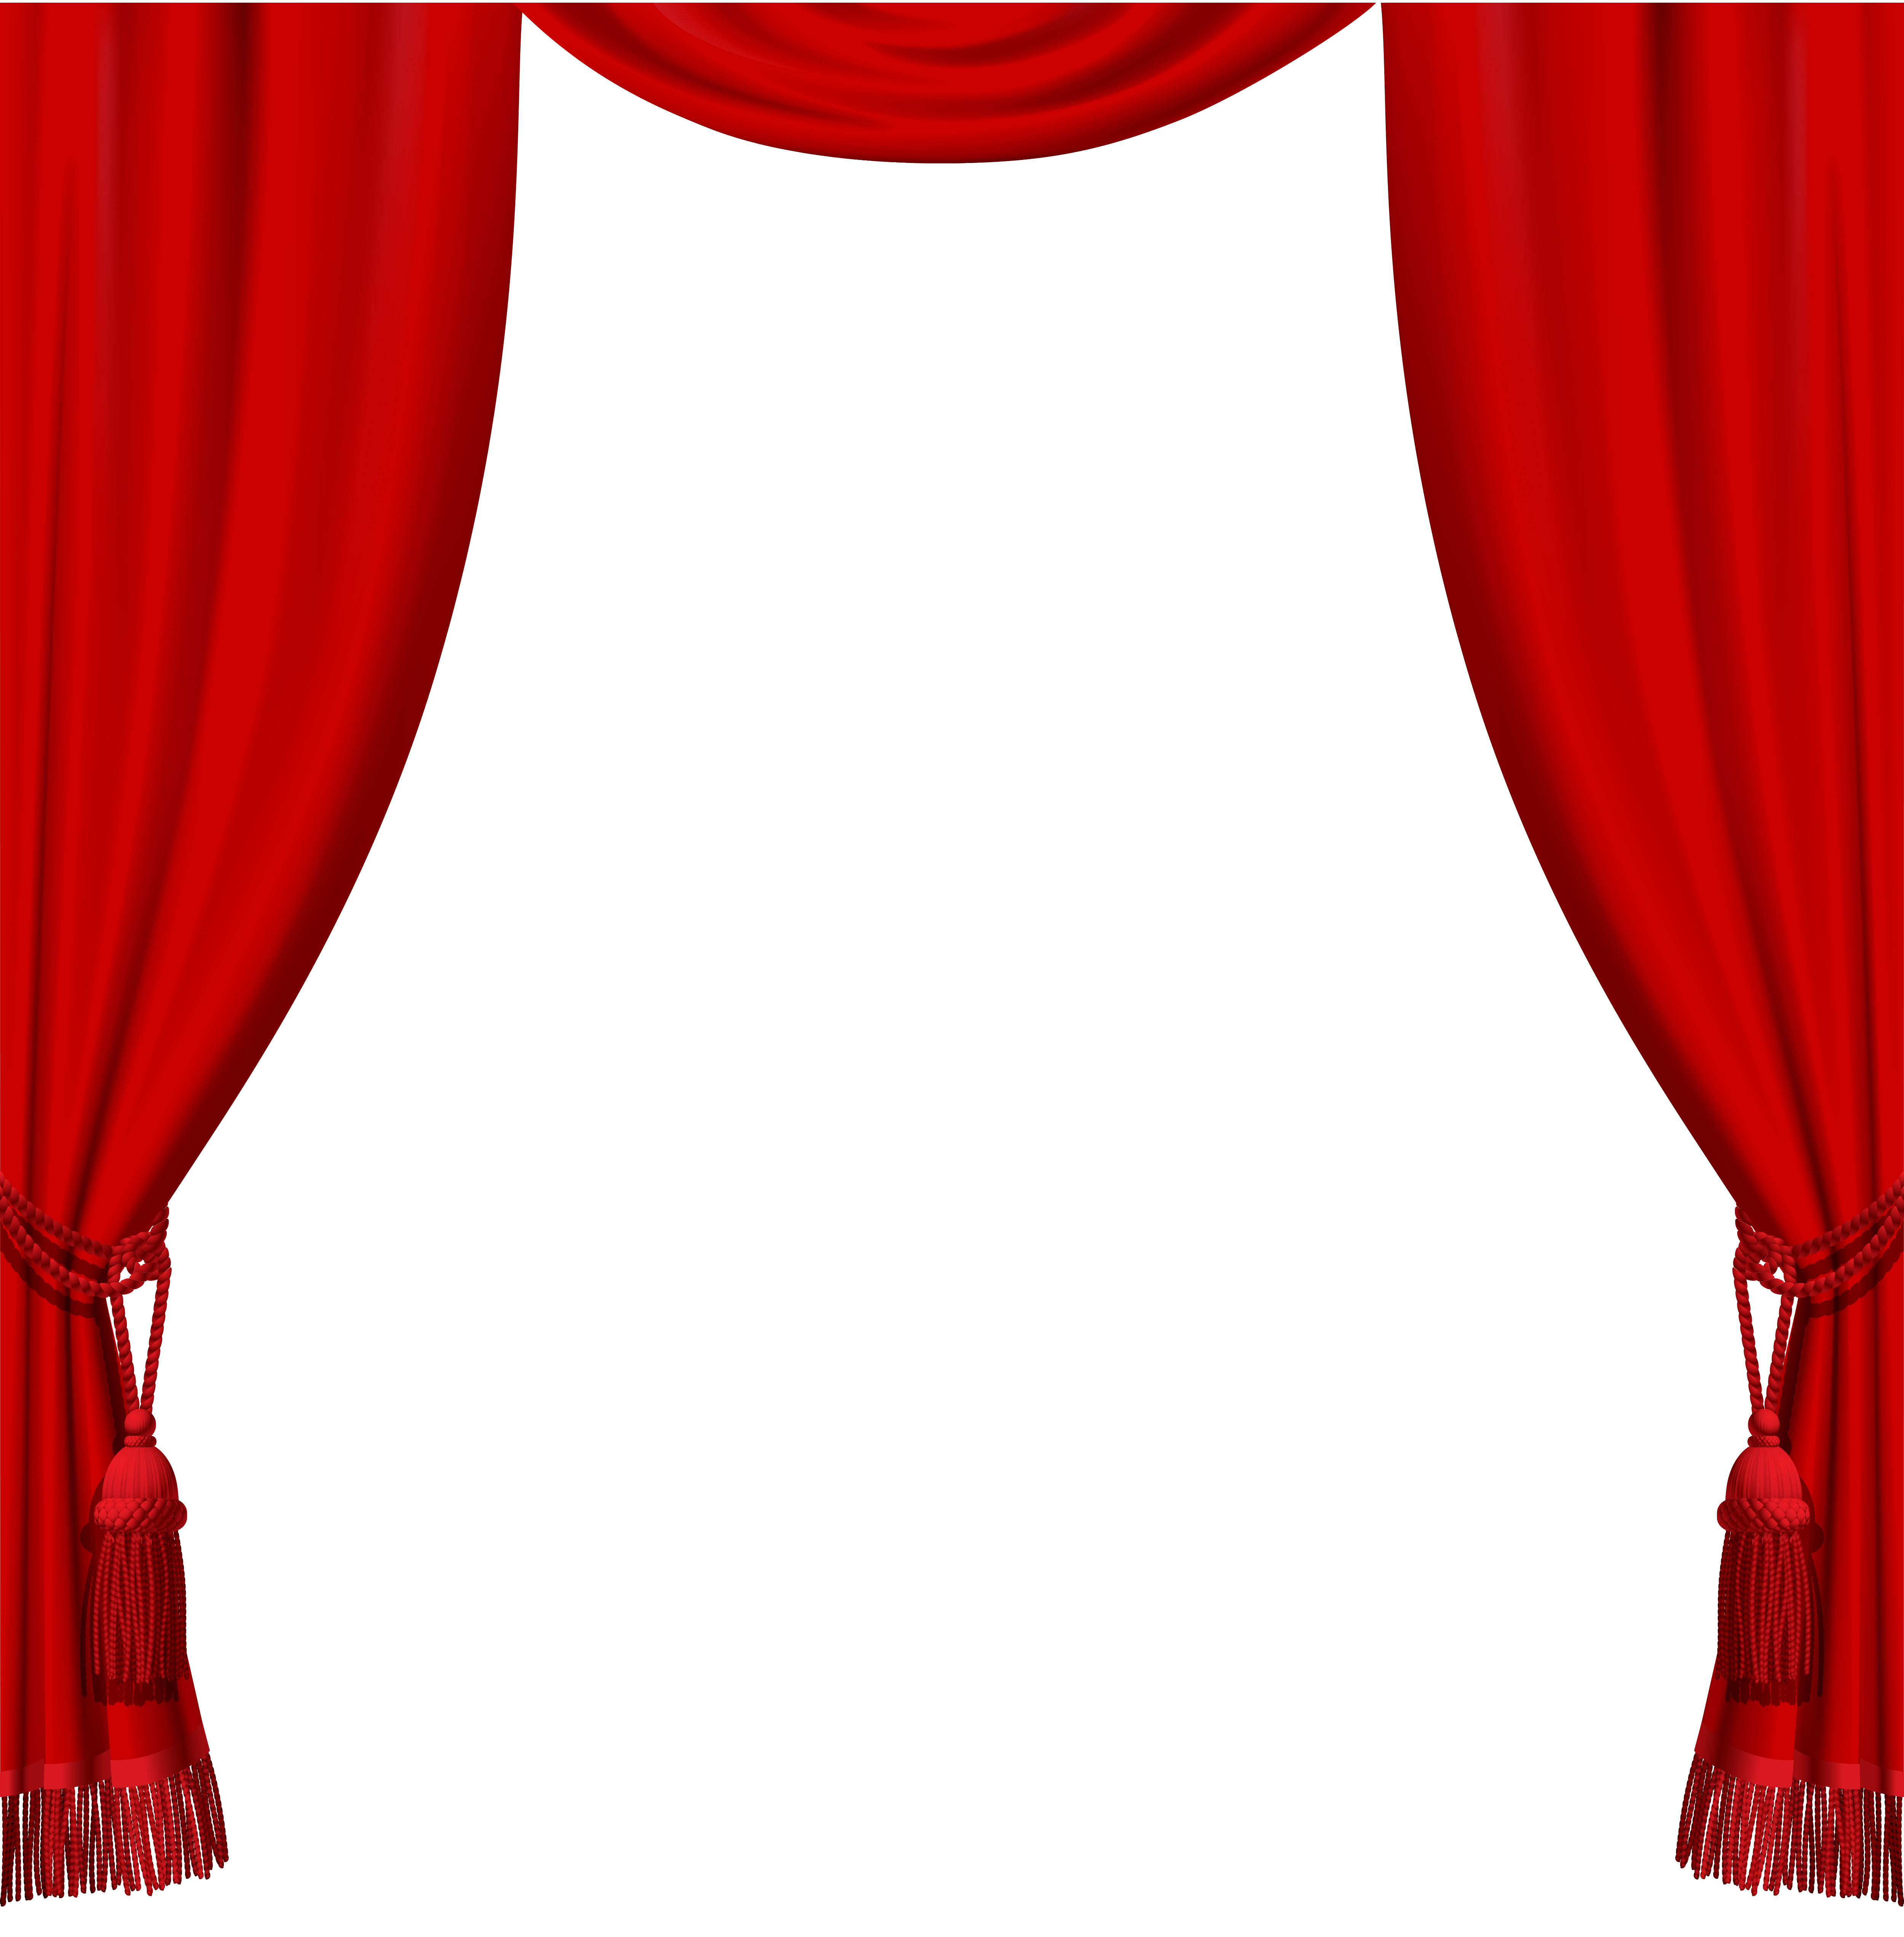 Red Curtain Clip Art-Red Curtain Clip Art-14